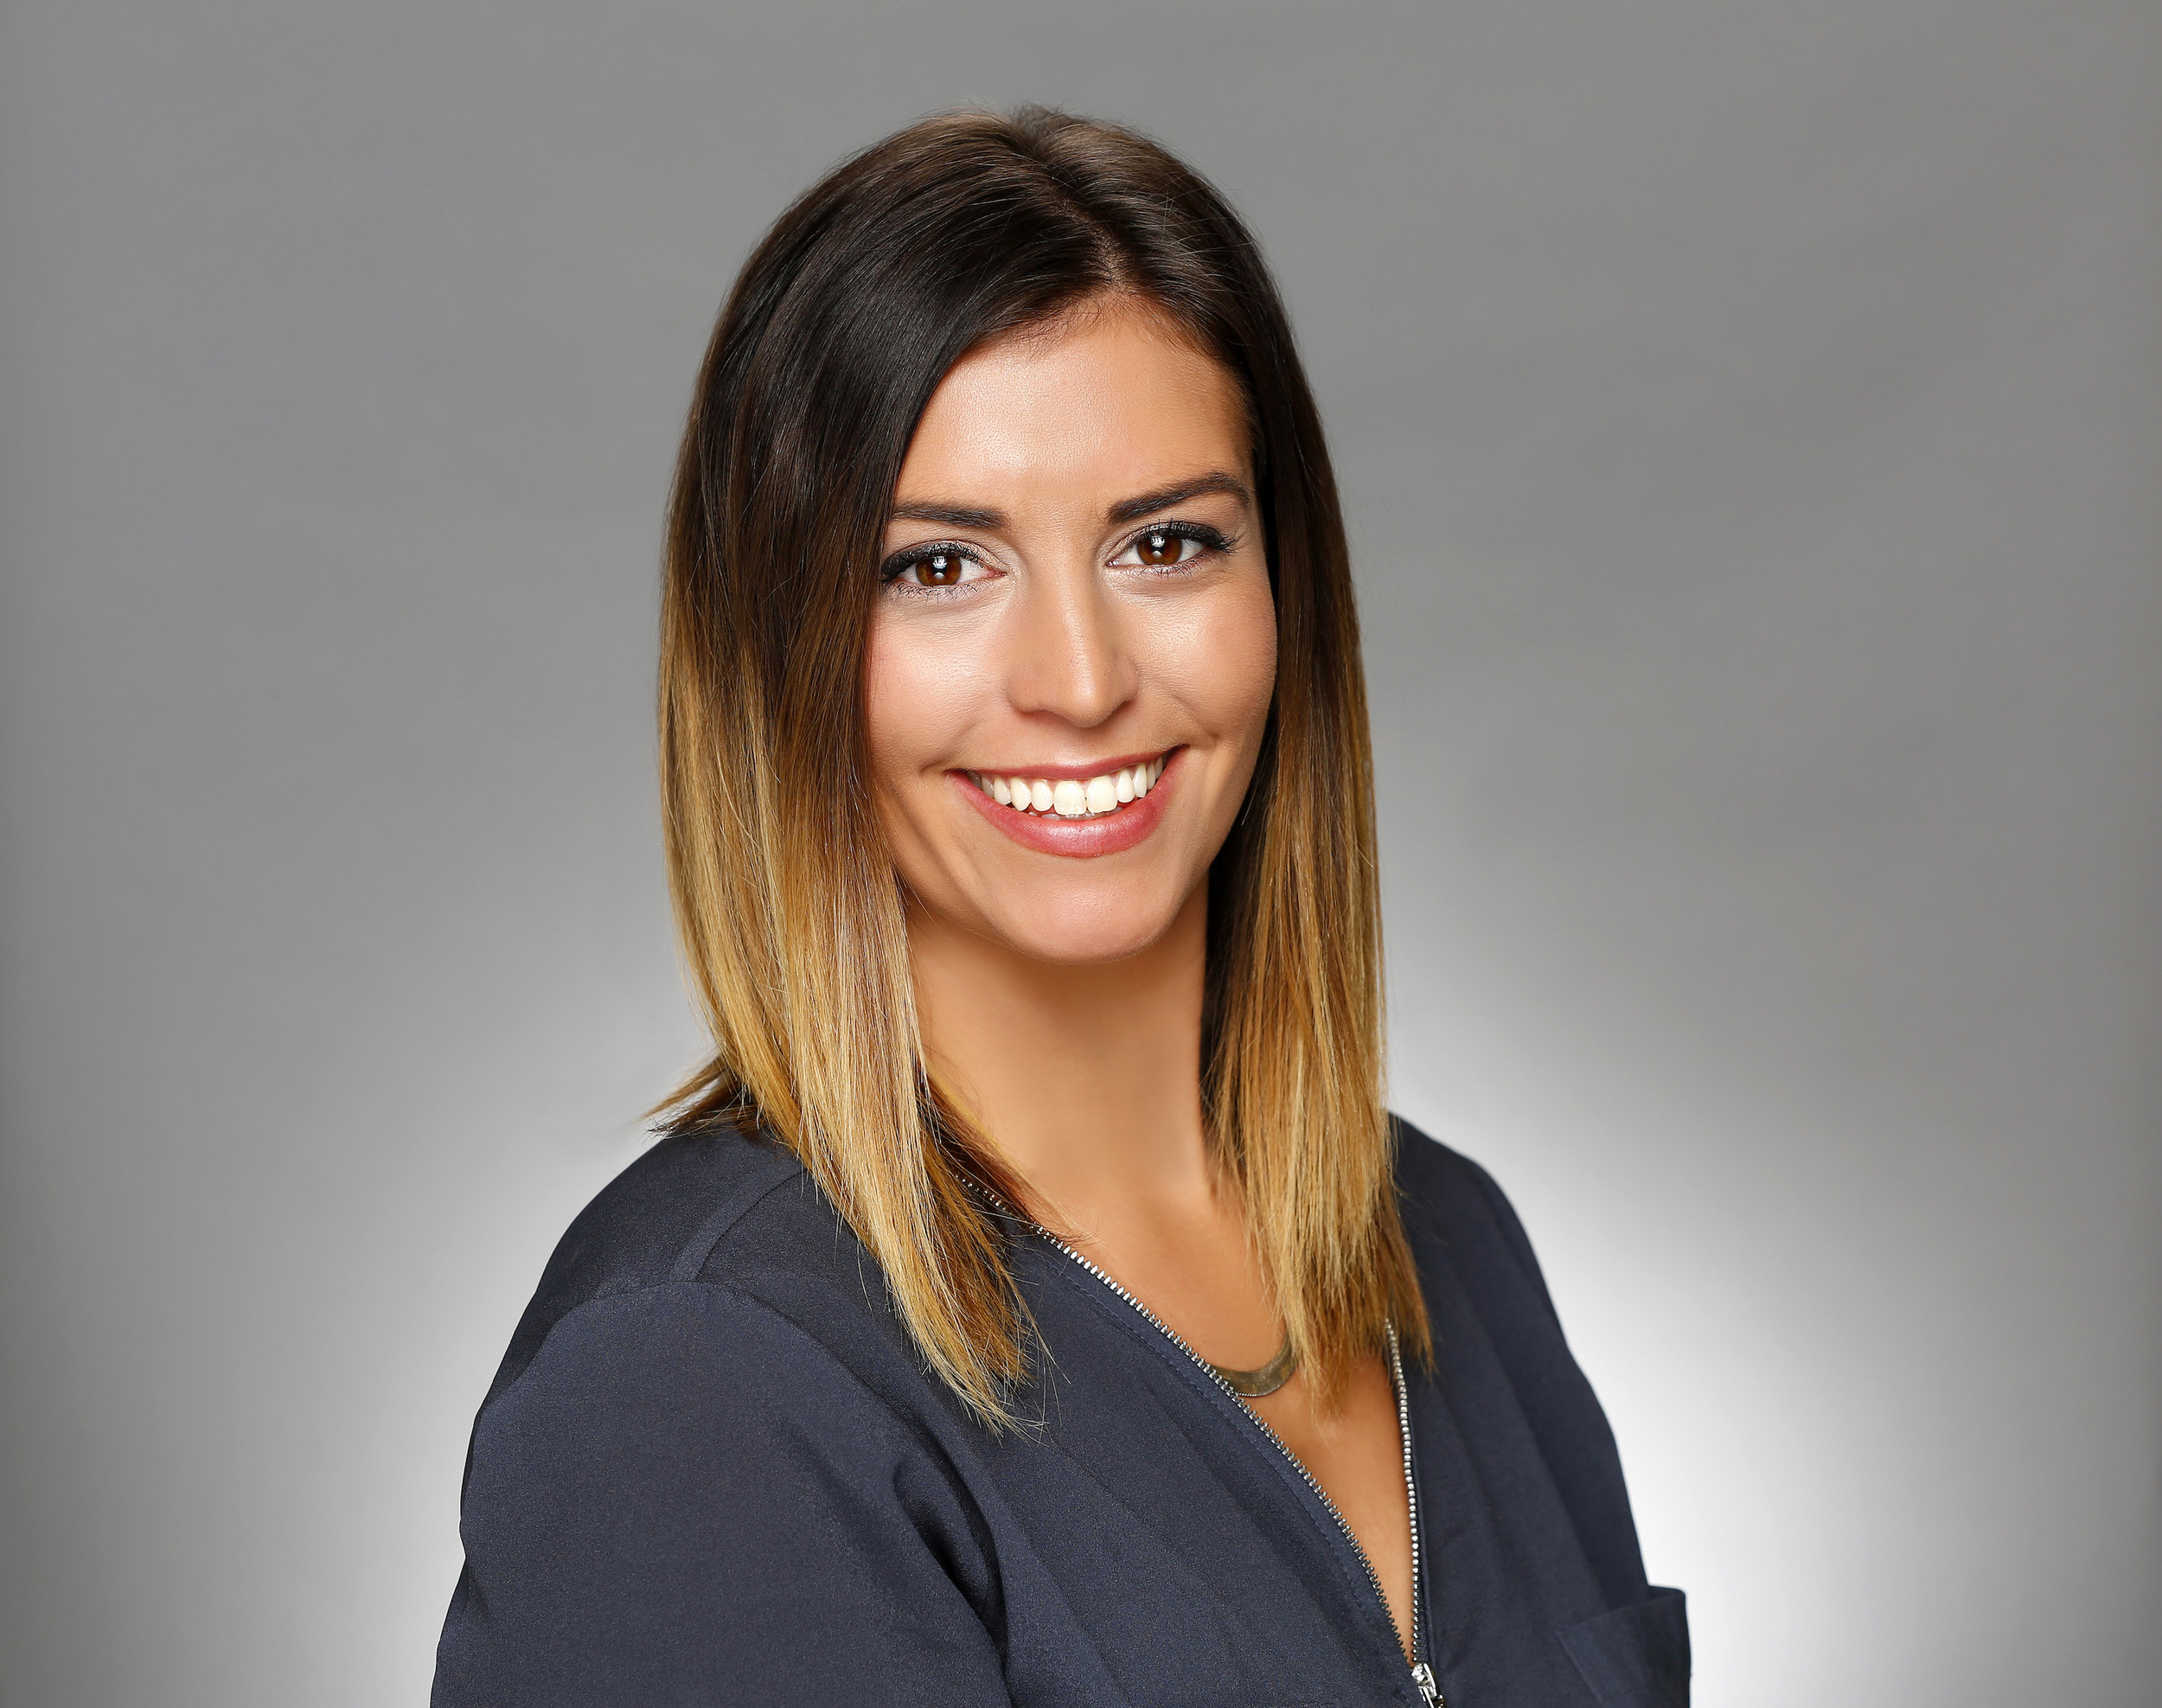 Alisa Alvich, Marketing & Communications '12